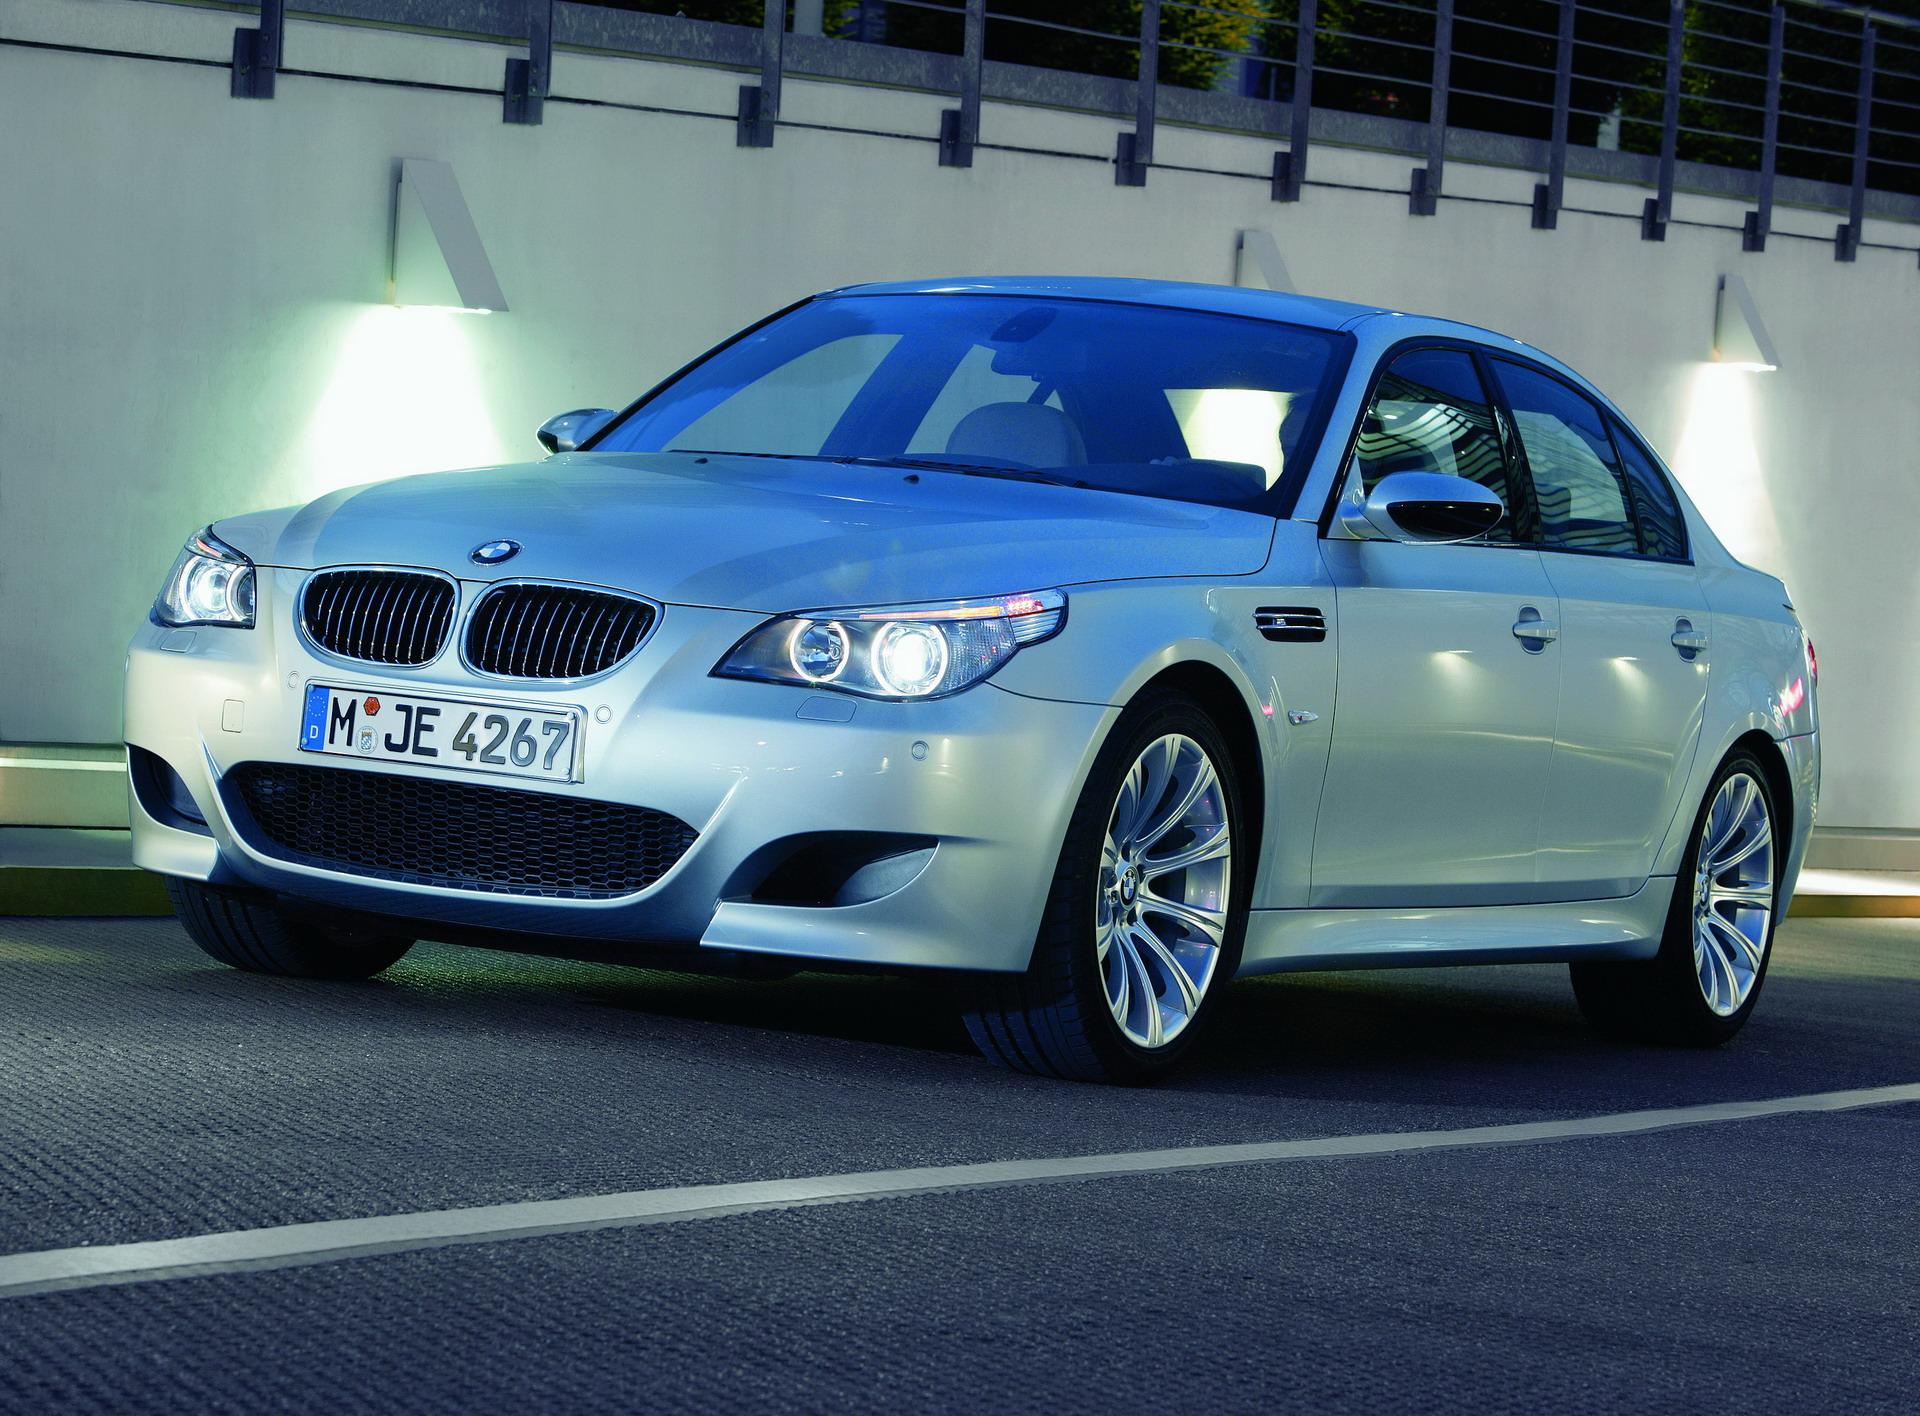 BMW M5 E60M 2005 1